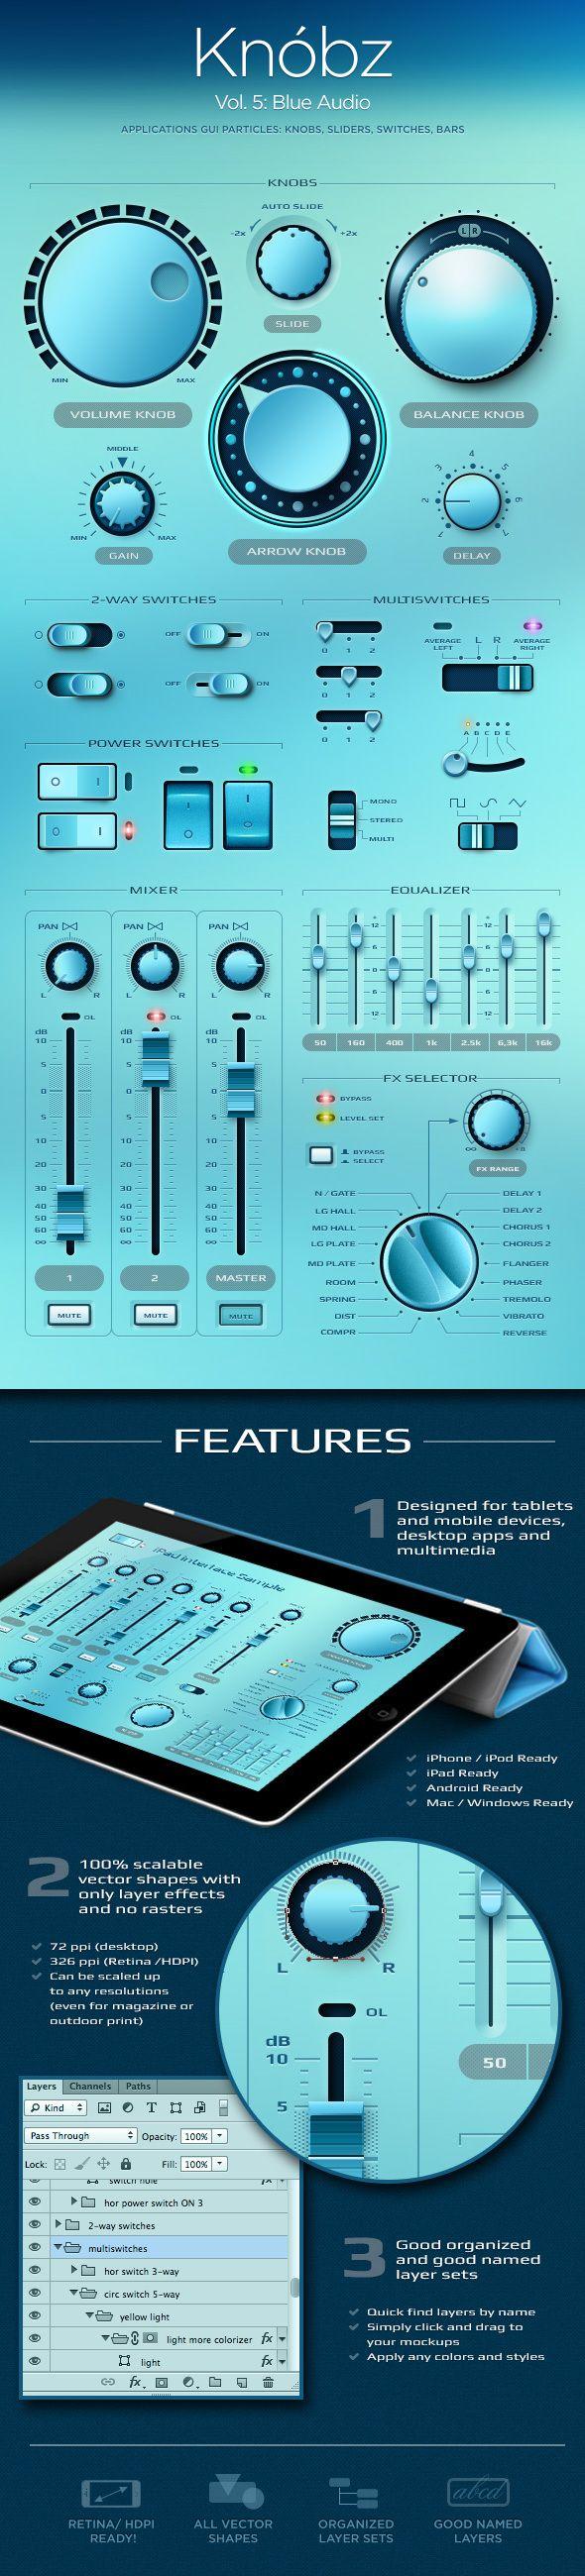 Slick Blue Interface. Love that designers can run with a theme and kill it.   Knóbz Vol.5 Blue Audio by Alexey Kolpikov, via Behance